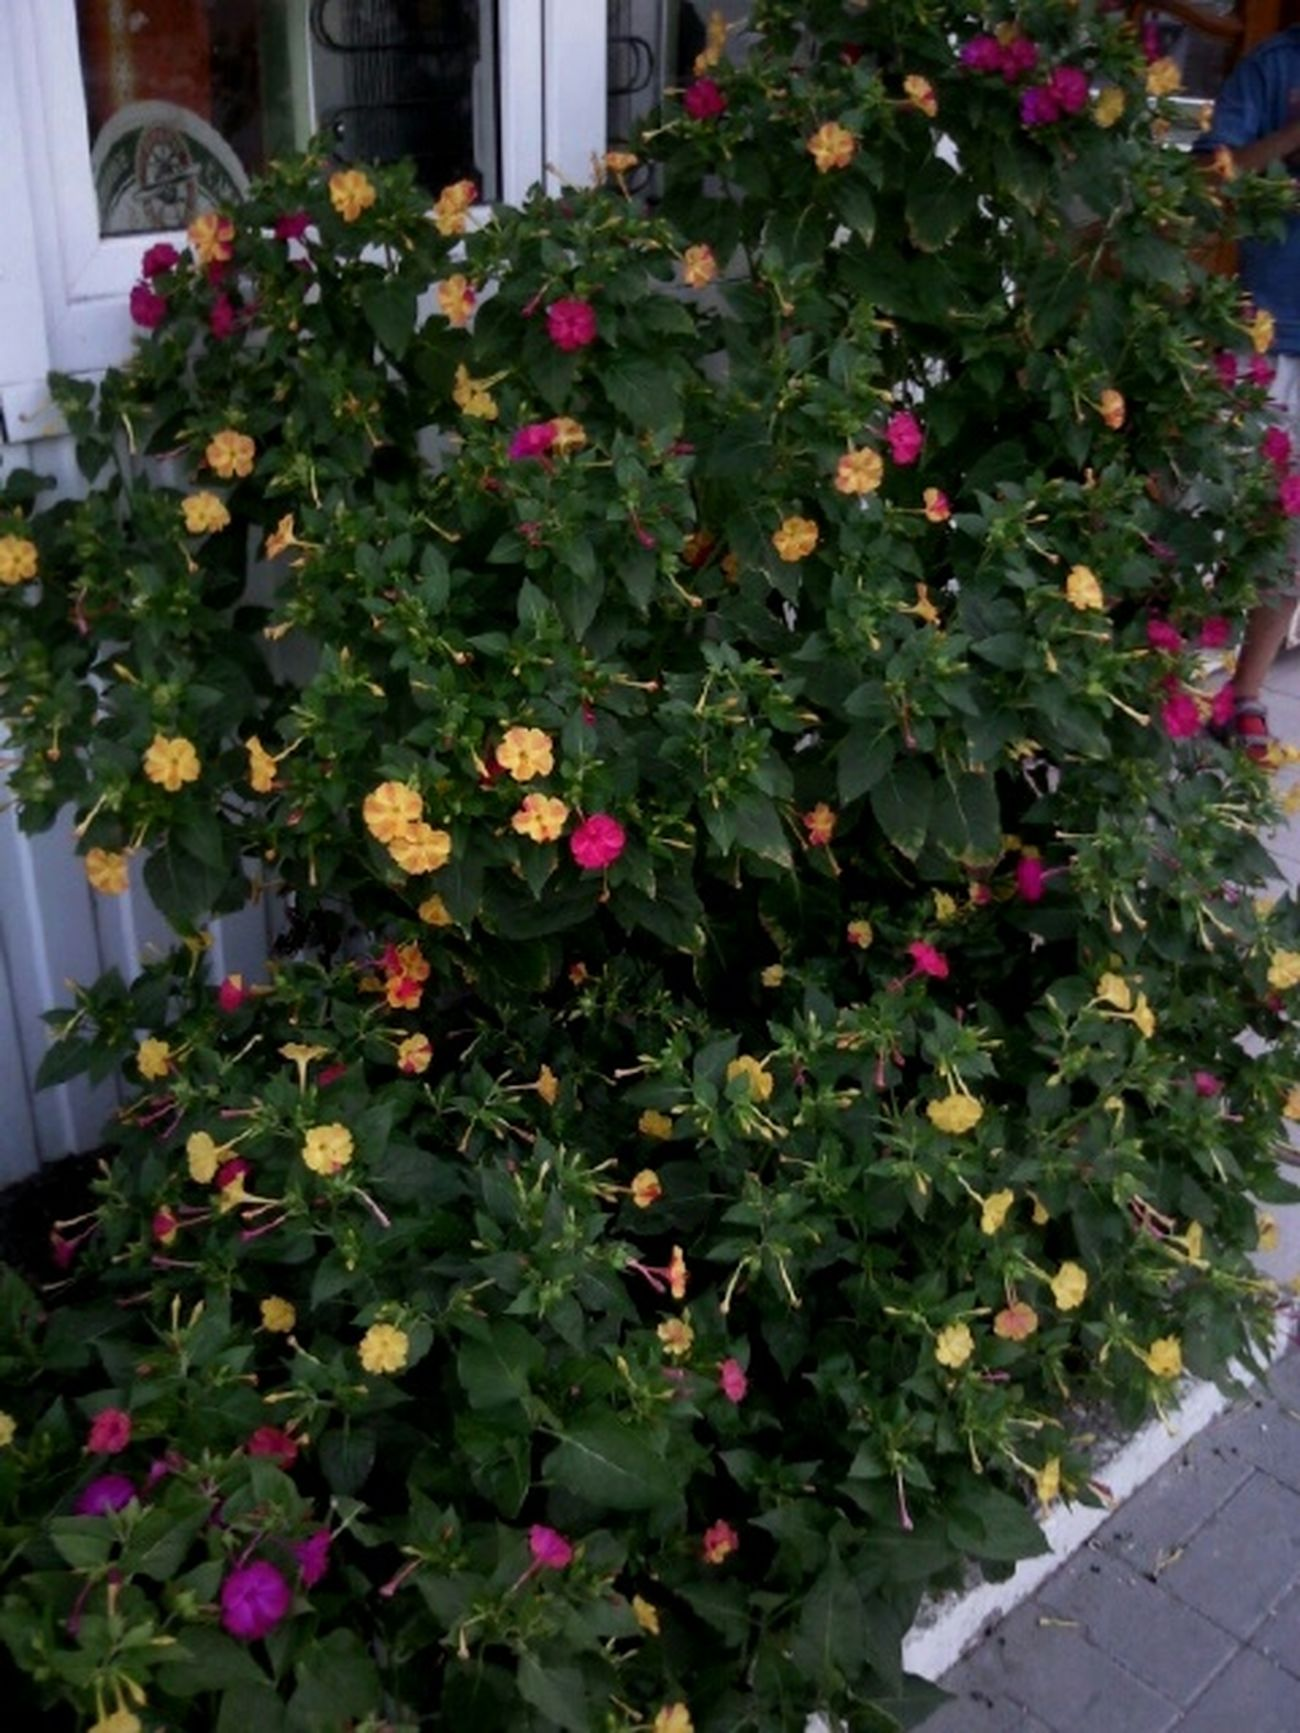 There's no any photo editing. Без фоторедактирования. Мирабилис Ночная красавица июль Mirabilis Flowerets July Belle De Nuit Juillet